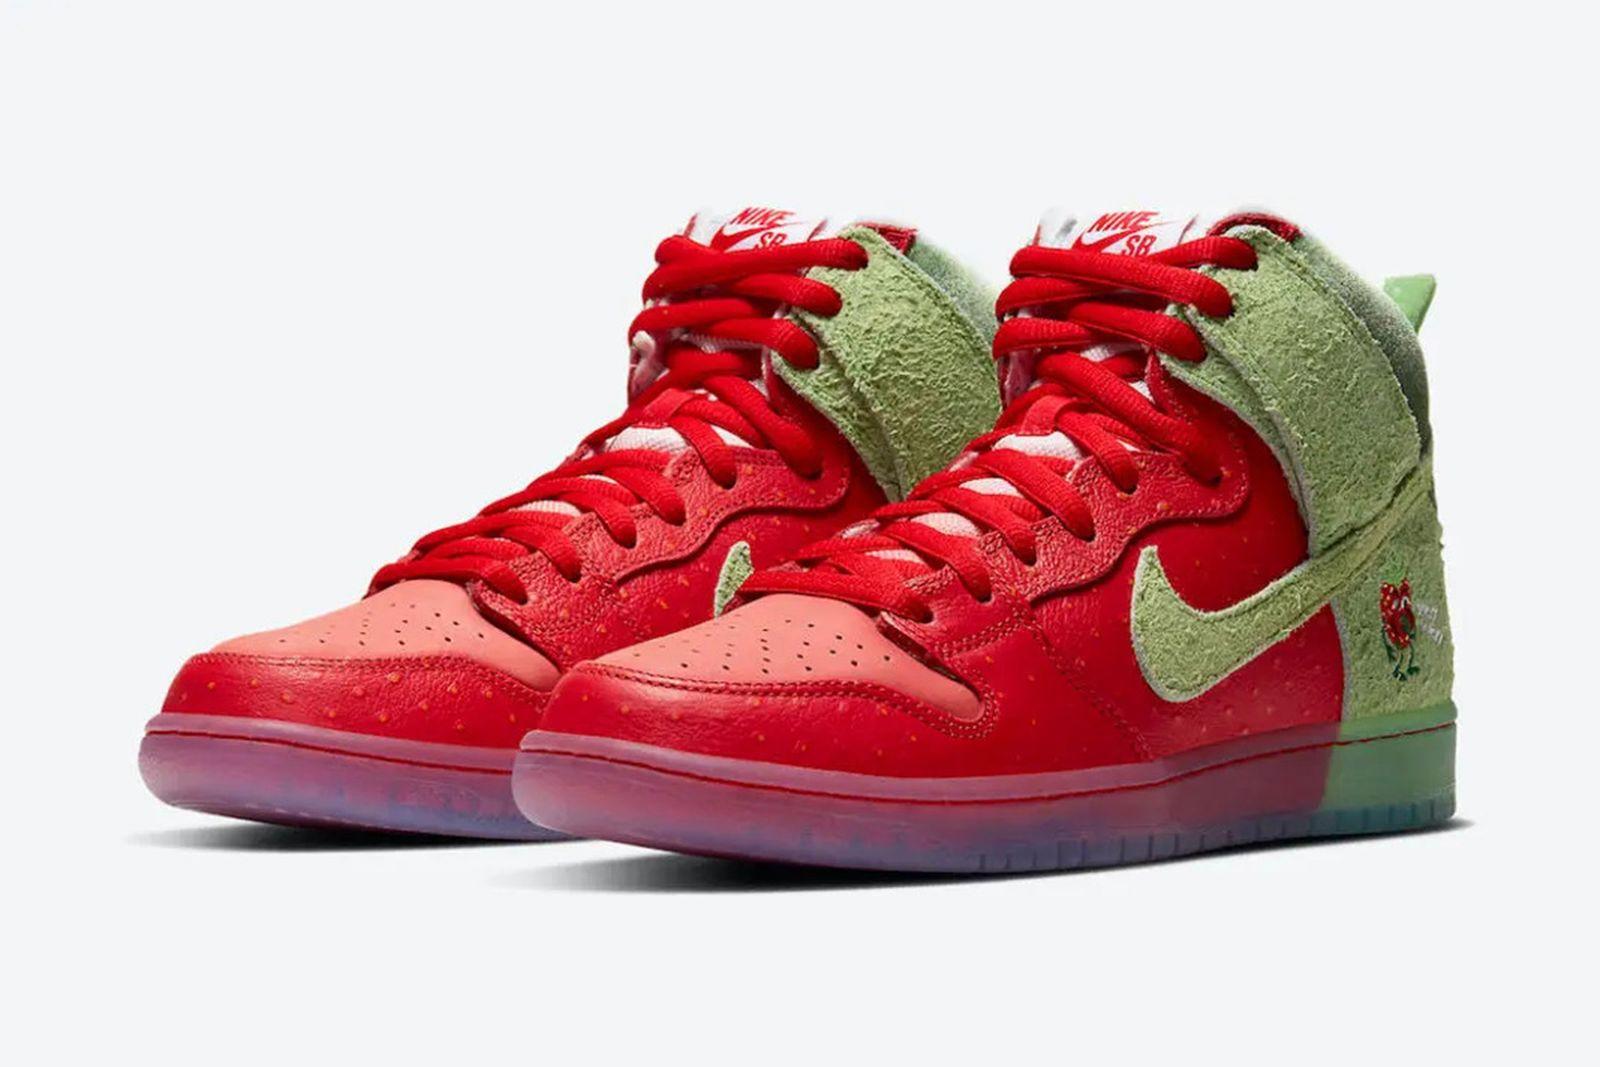 -nike-sb-dunk-high-strawberry-cough-